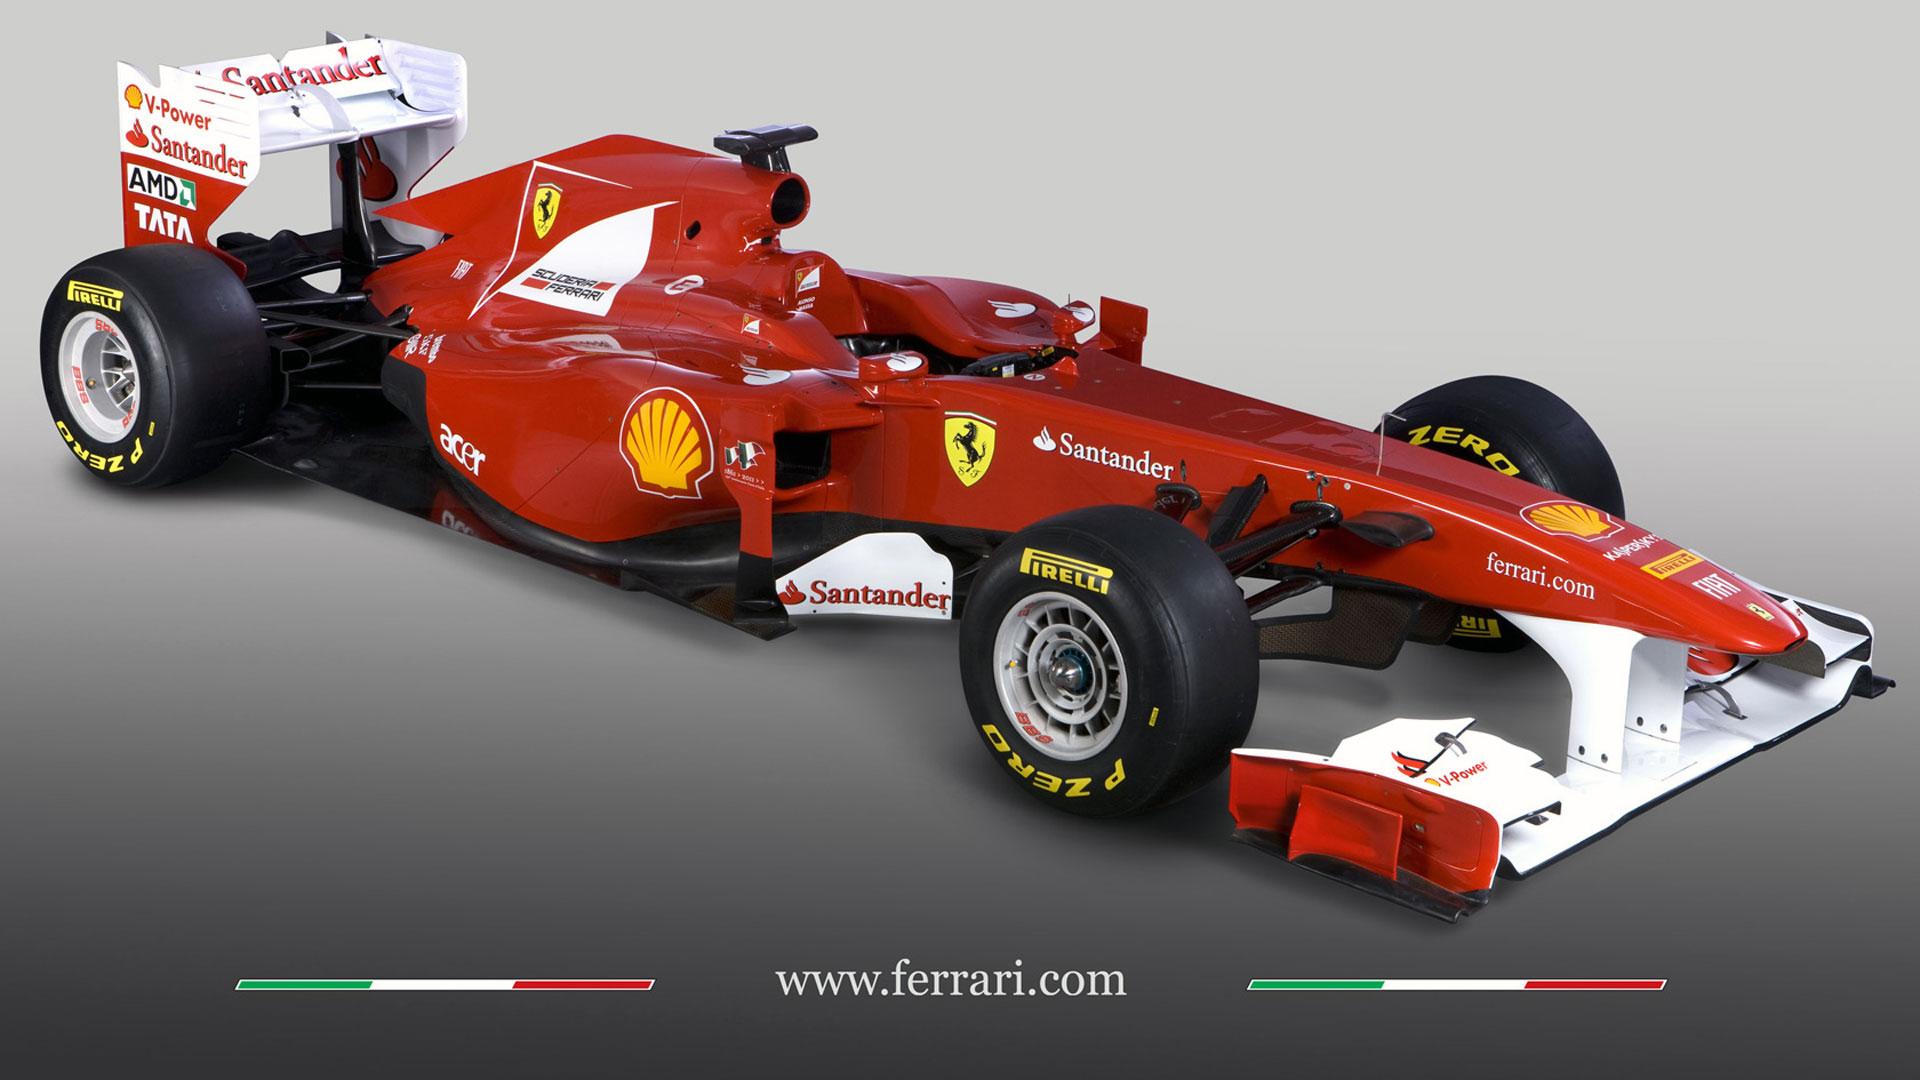 Formula 1 2011 Ferrari F150 F1 World Cars Wallpaper For Iphone